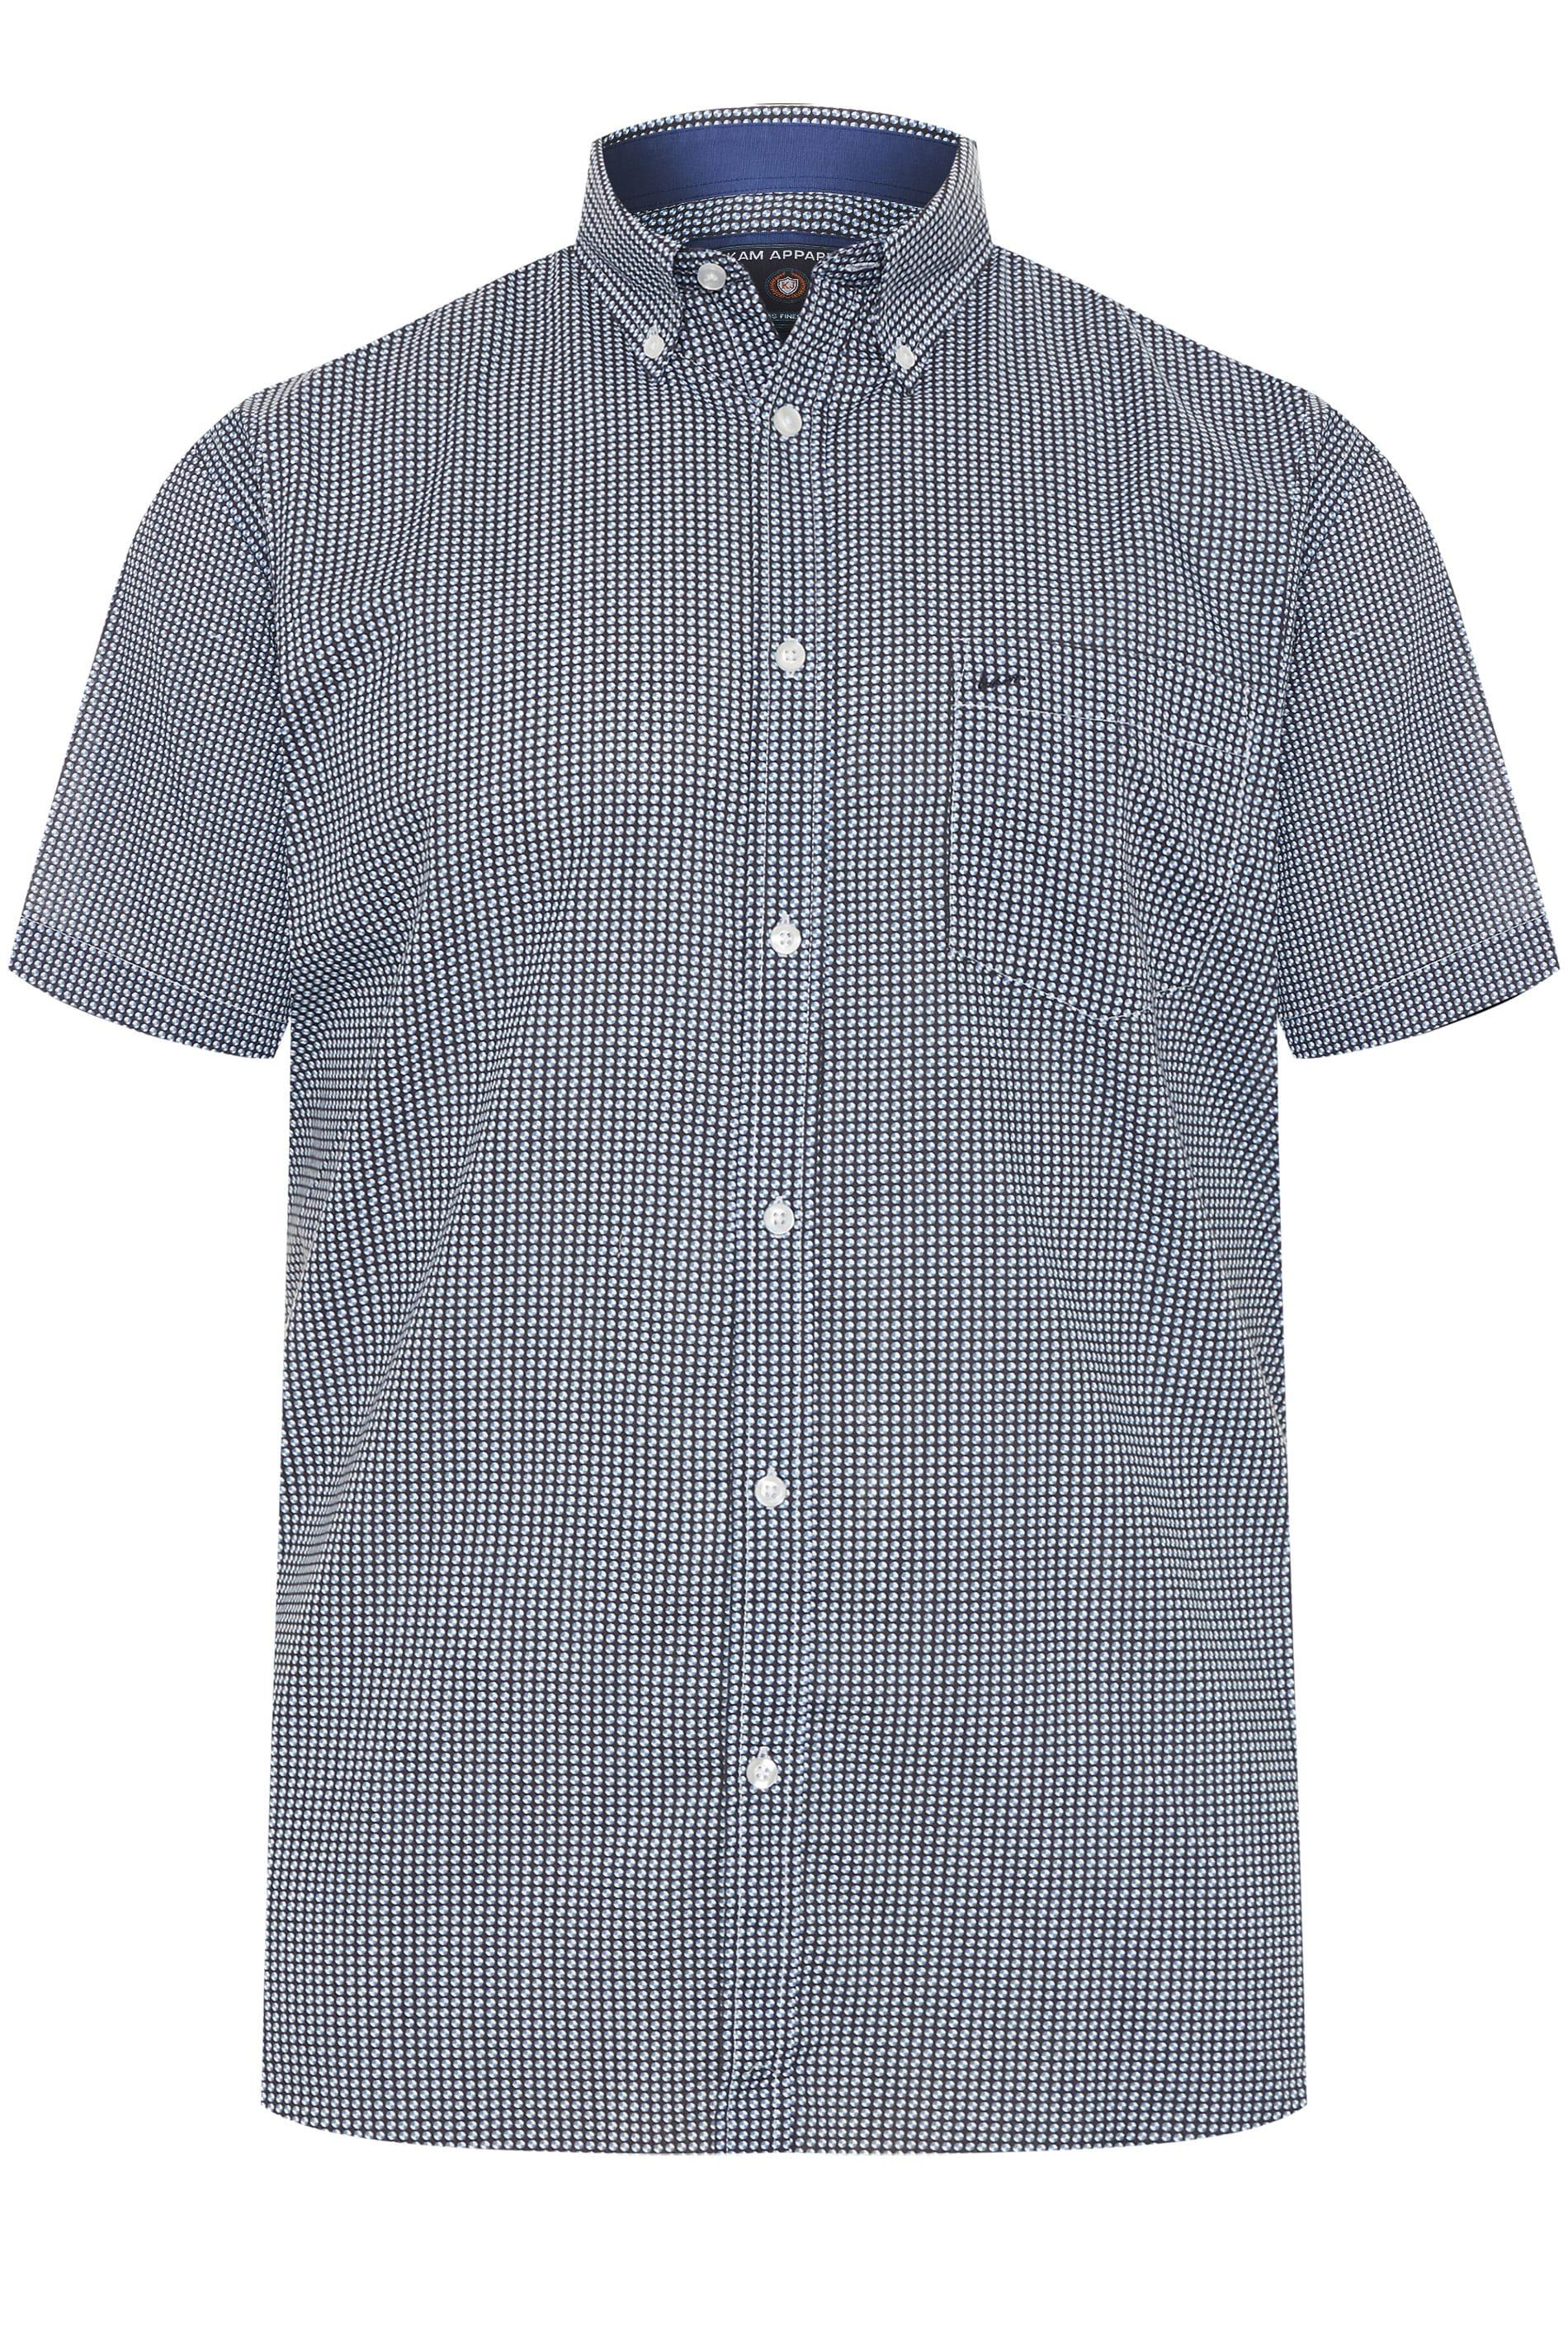 KAM Blue Denim Patterned Shirt